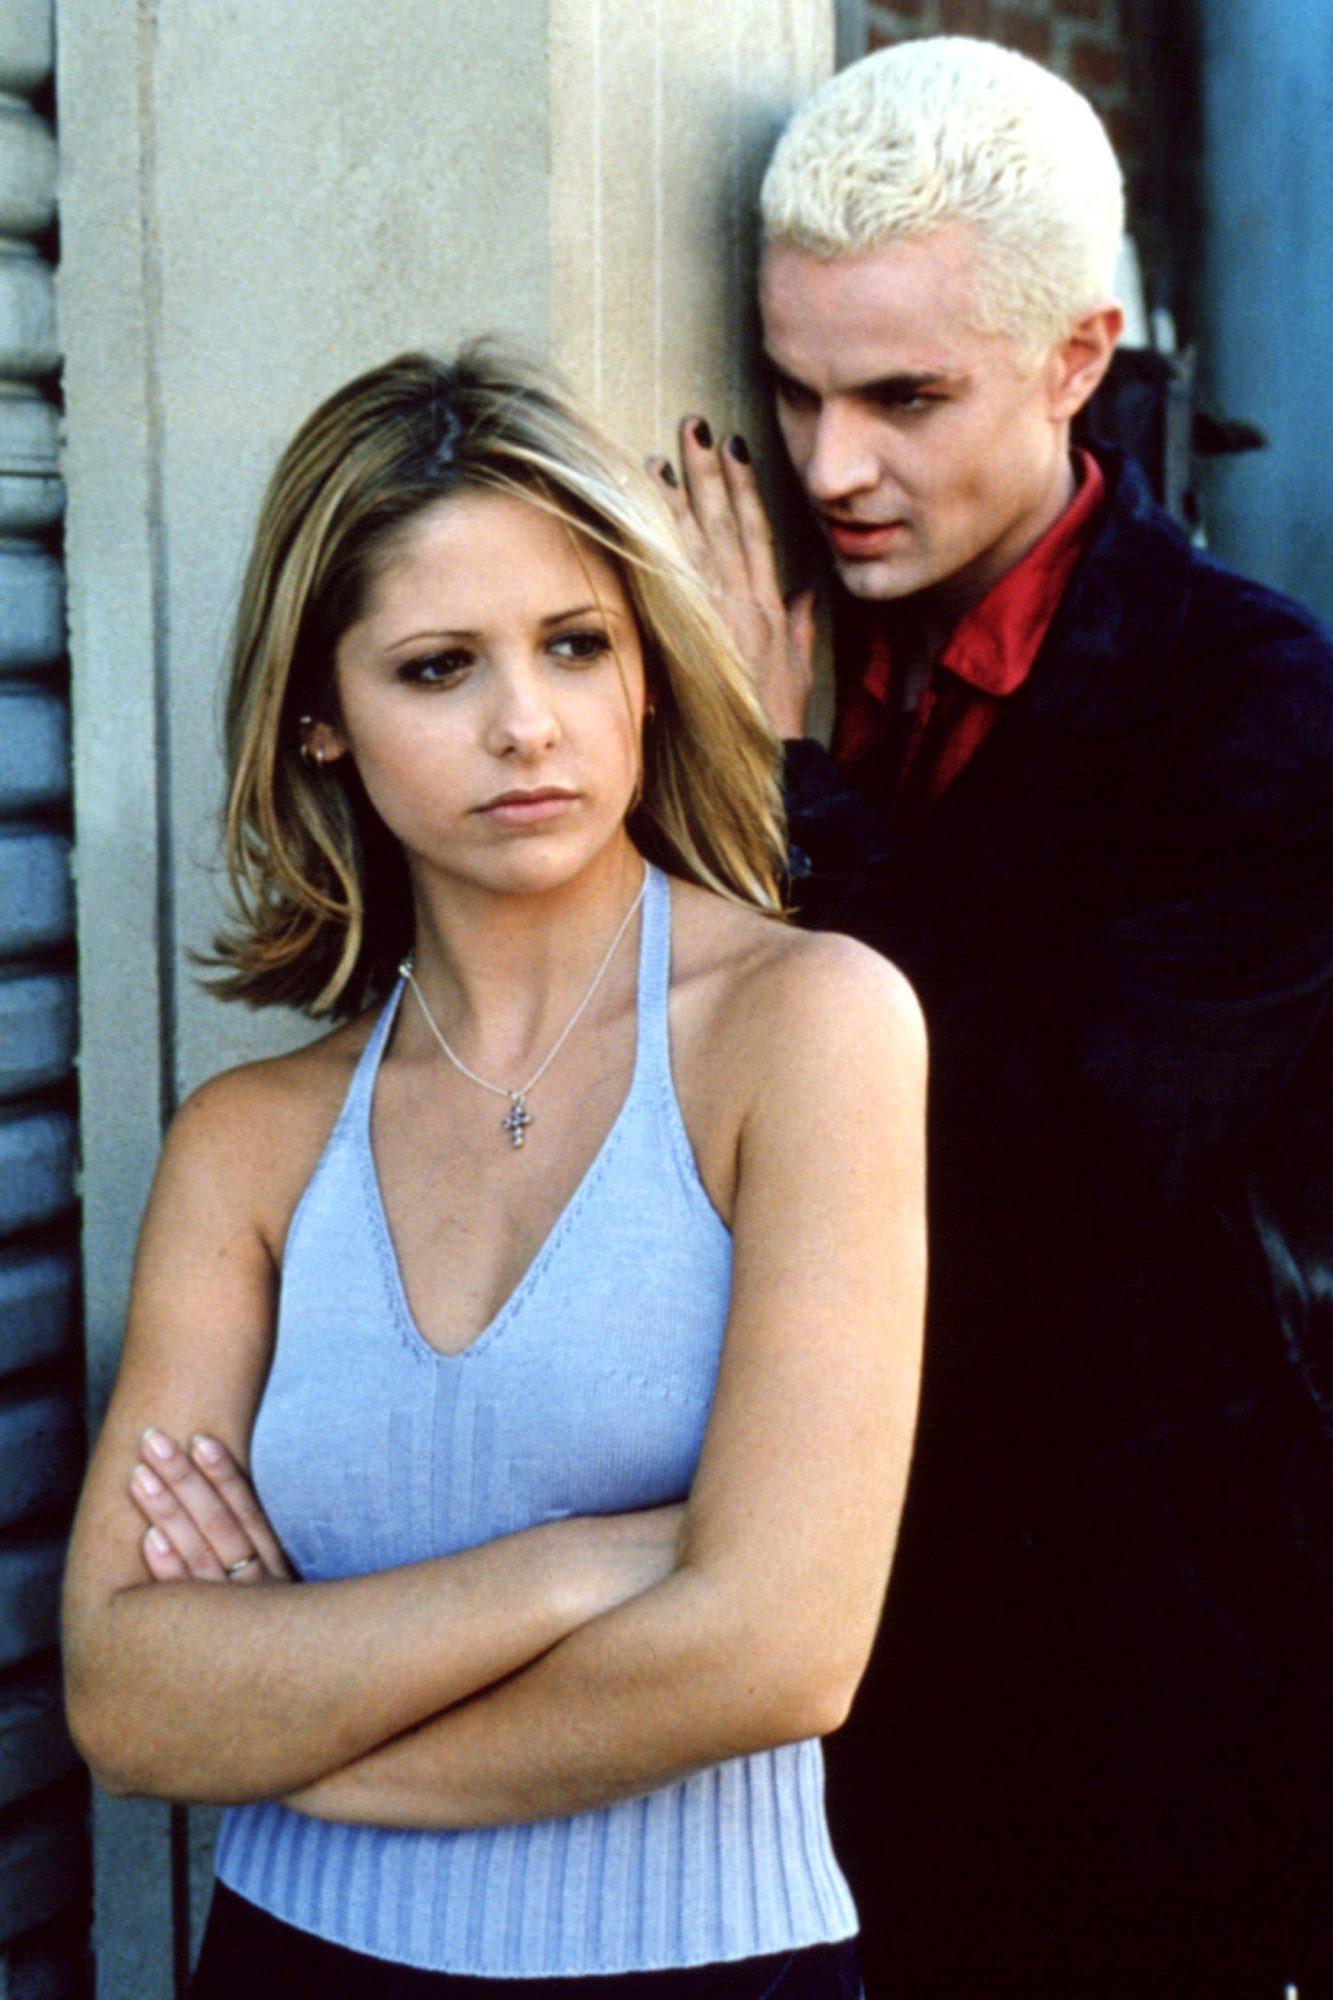 BUFFY THE VAMPIRE SLAYER, Sarah Michelle Gellar, James Marsters, 1996-2003, Season 3, TM and Copyri